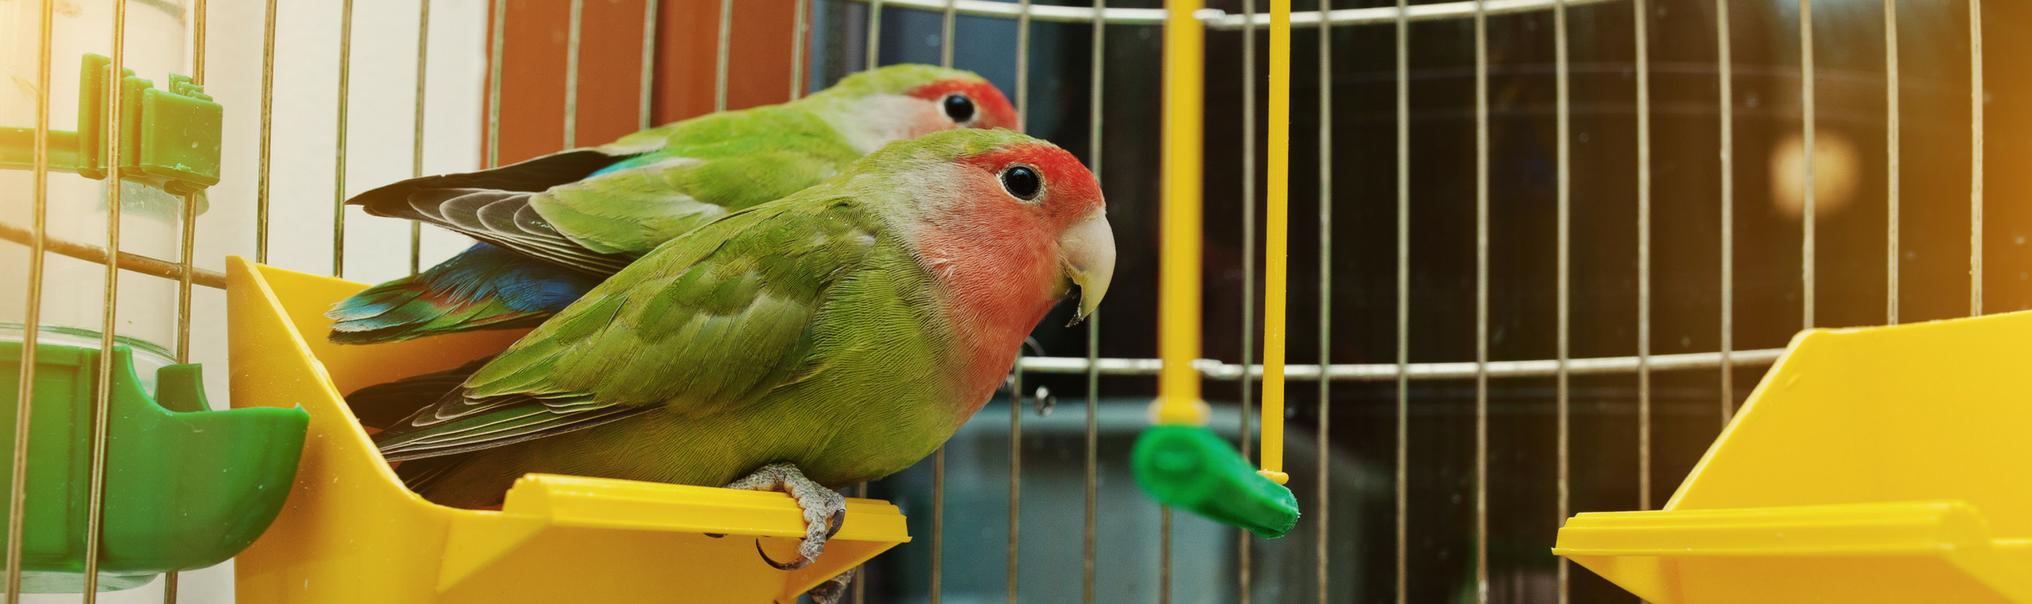 bird services